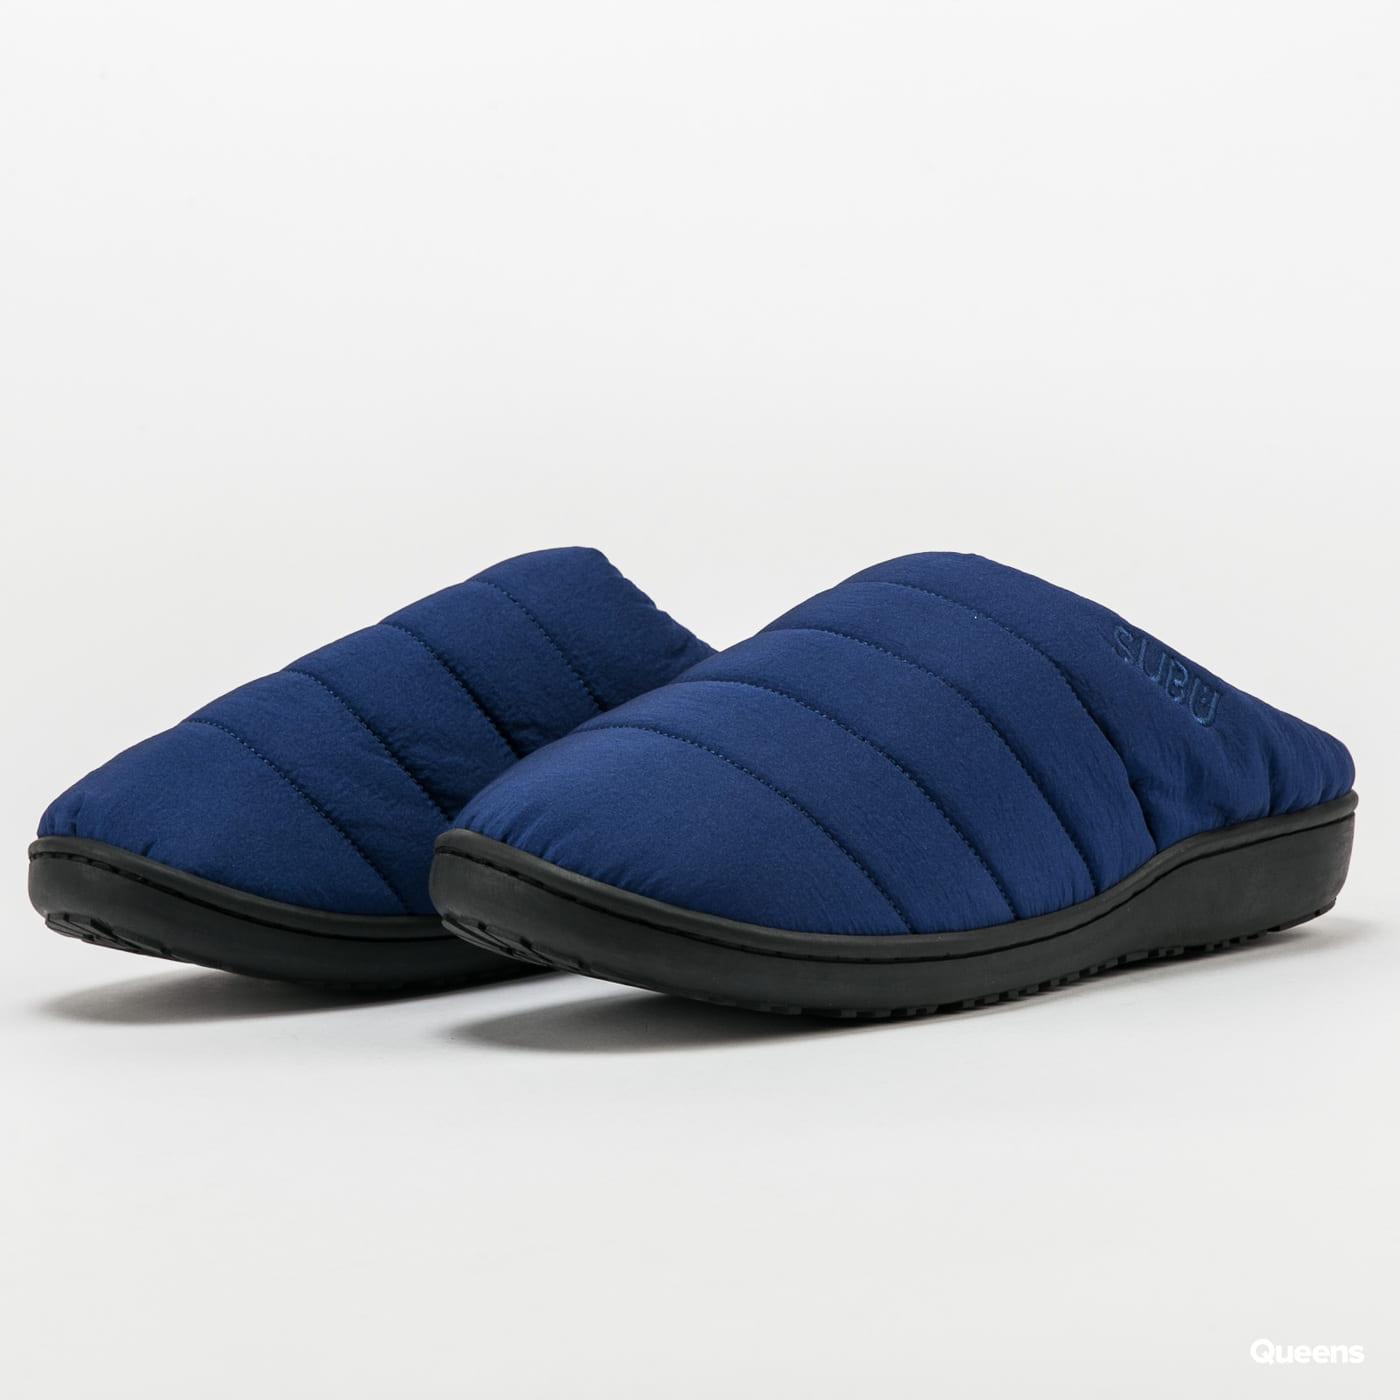 SUBU The Winter Sandals undulate blue